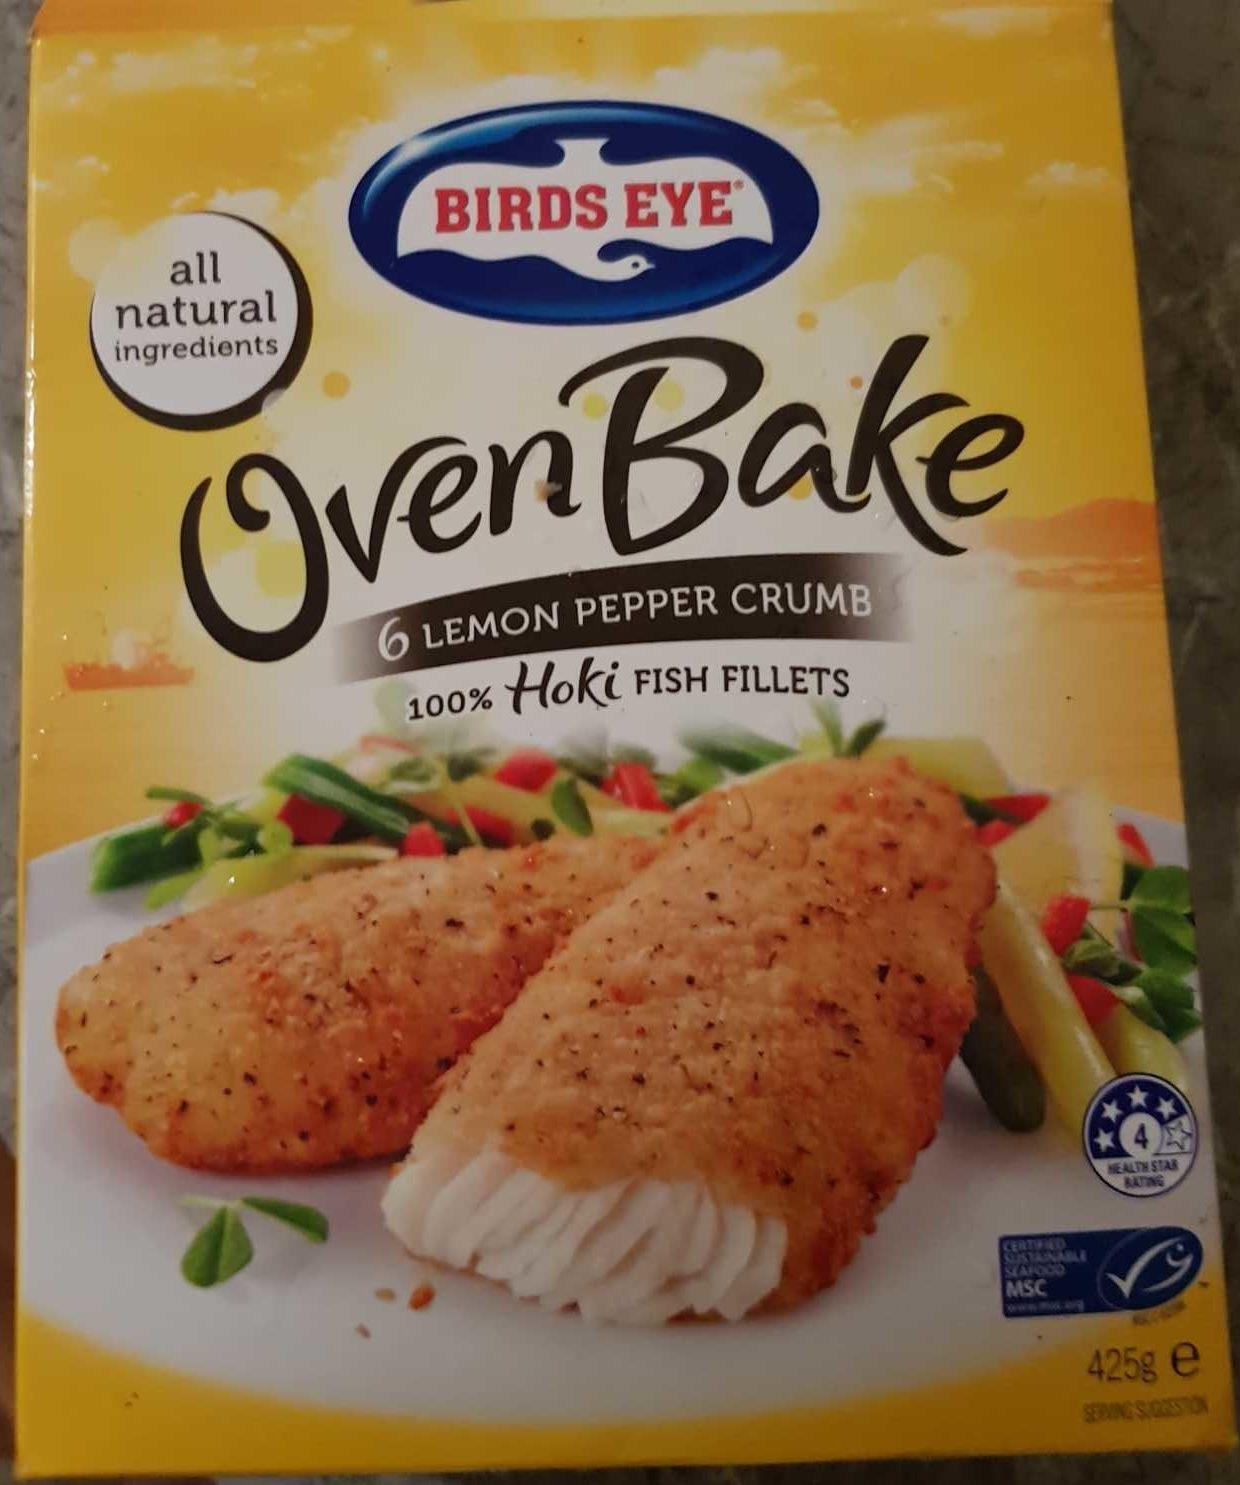 Oven Bake 6 Lemon Pepper Crumb 100% Fish Fillets - Produit - en